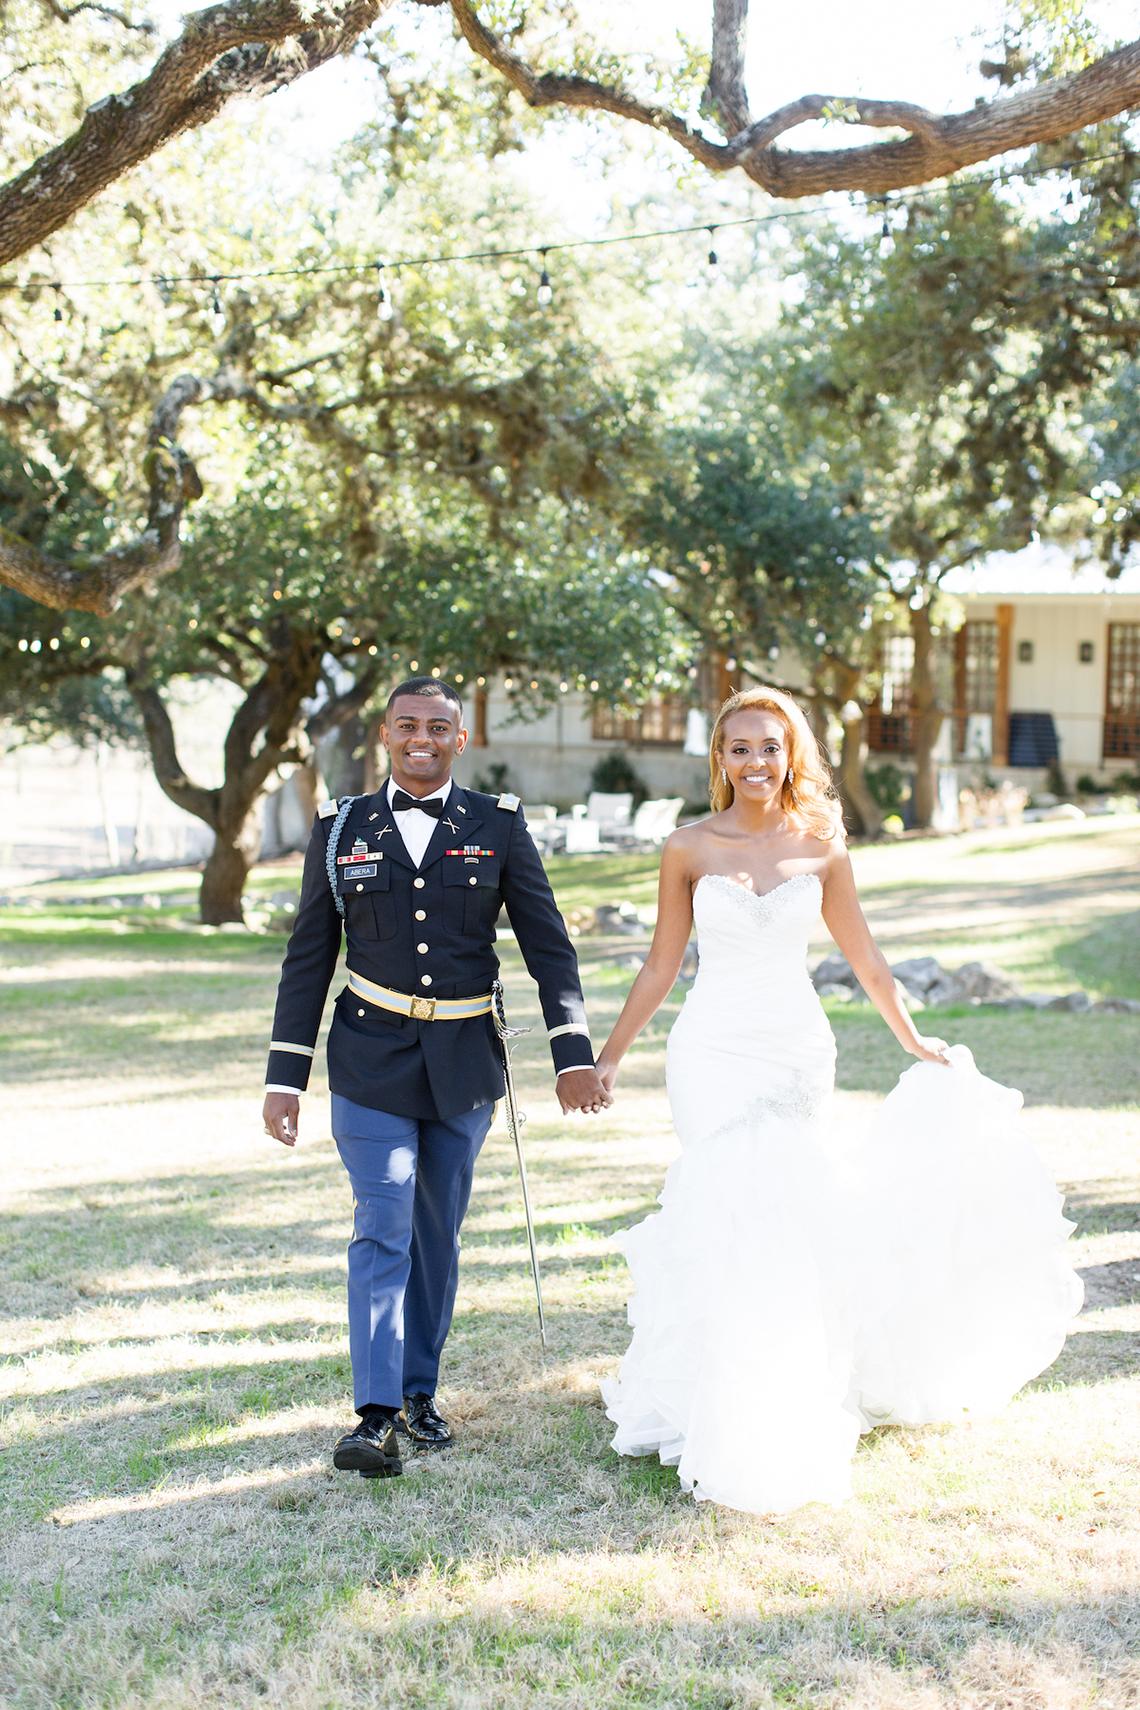 Glamorous Military Wedding in Texas – Angela Lally Photography 52